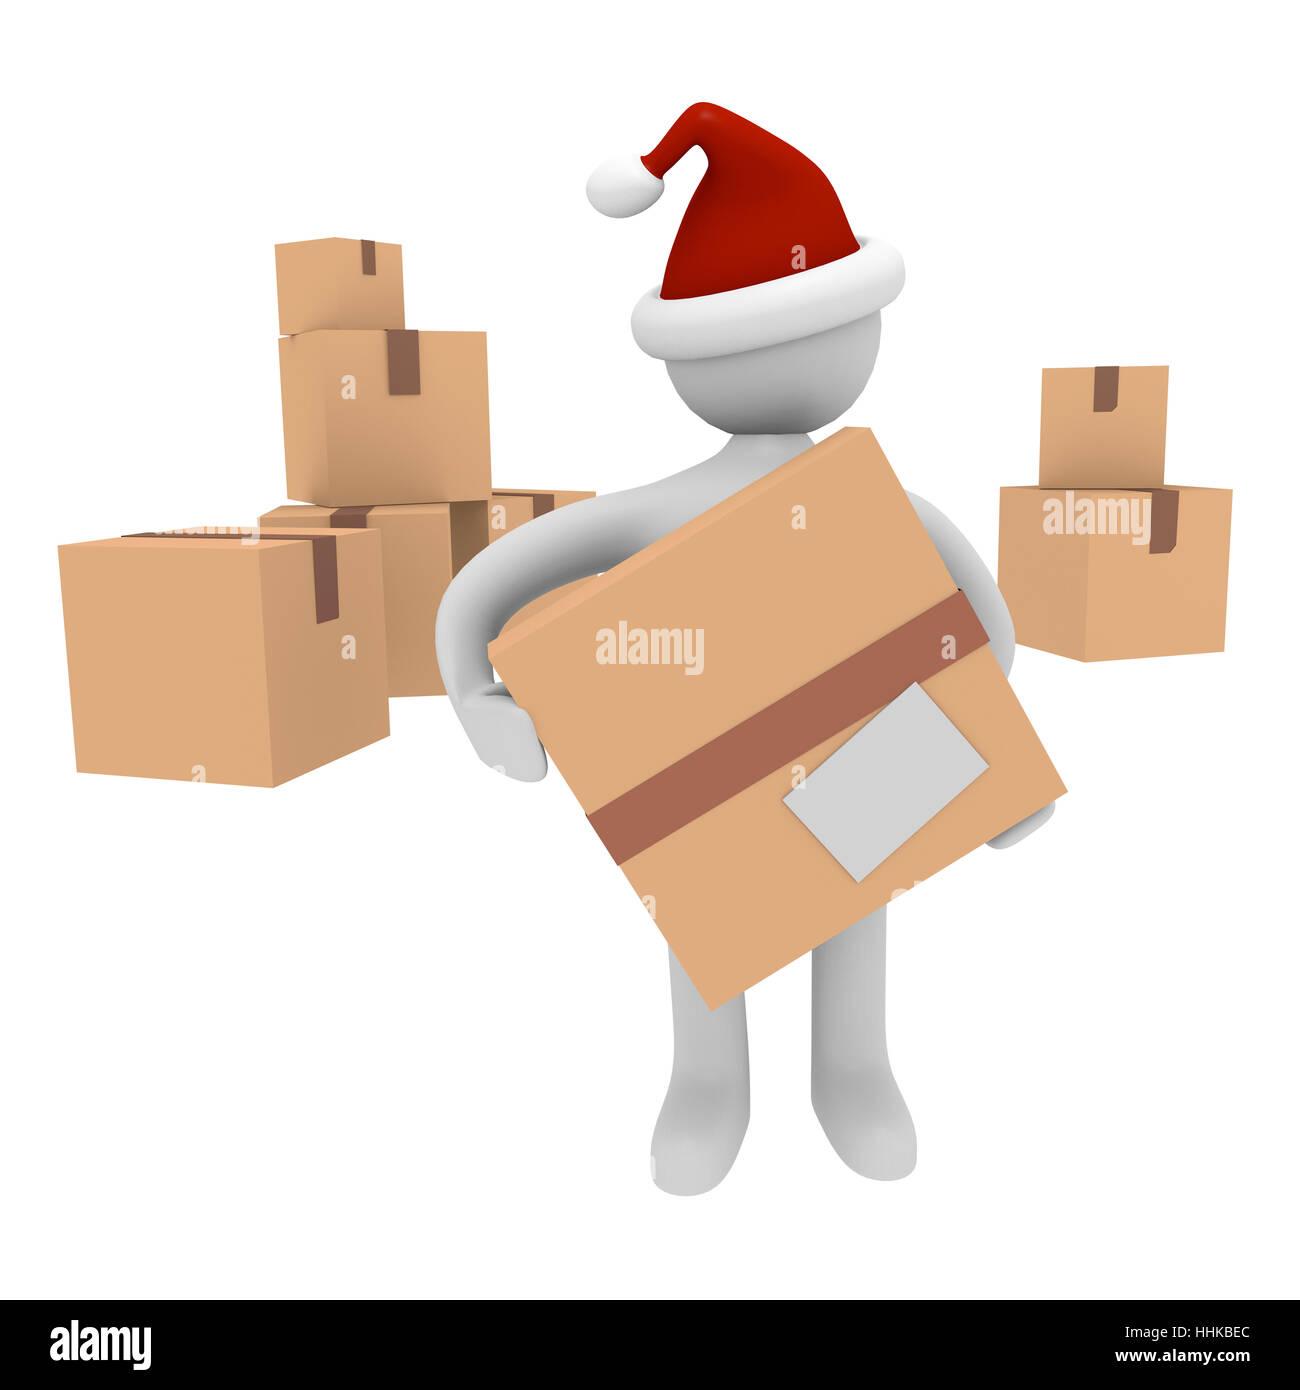 father christmas, nicholas, presents, cartons, christmas, xmas, x-mas, ok, Stock Photo